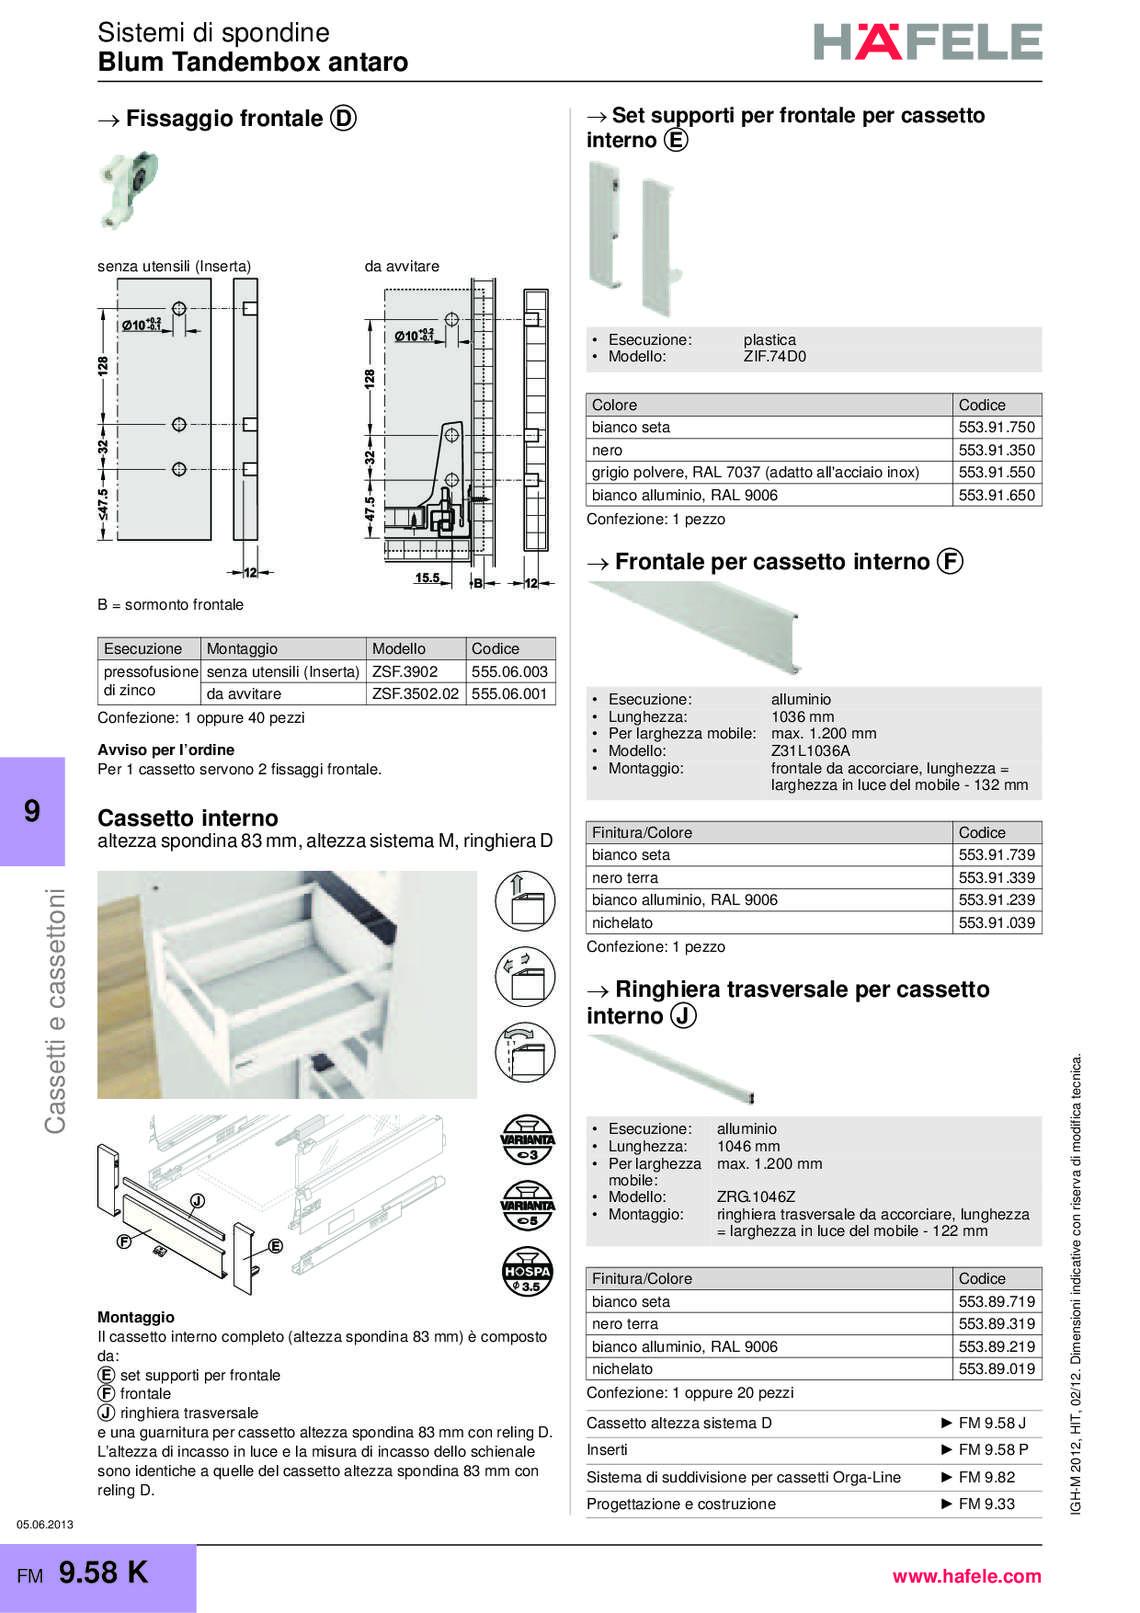 hafele-spondine-e-guide-per-mobili_40_085.jpg